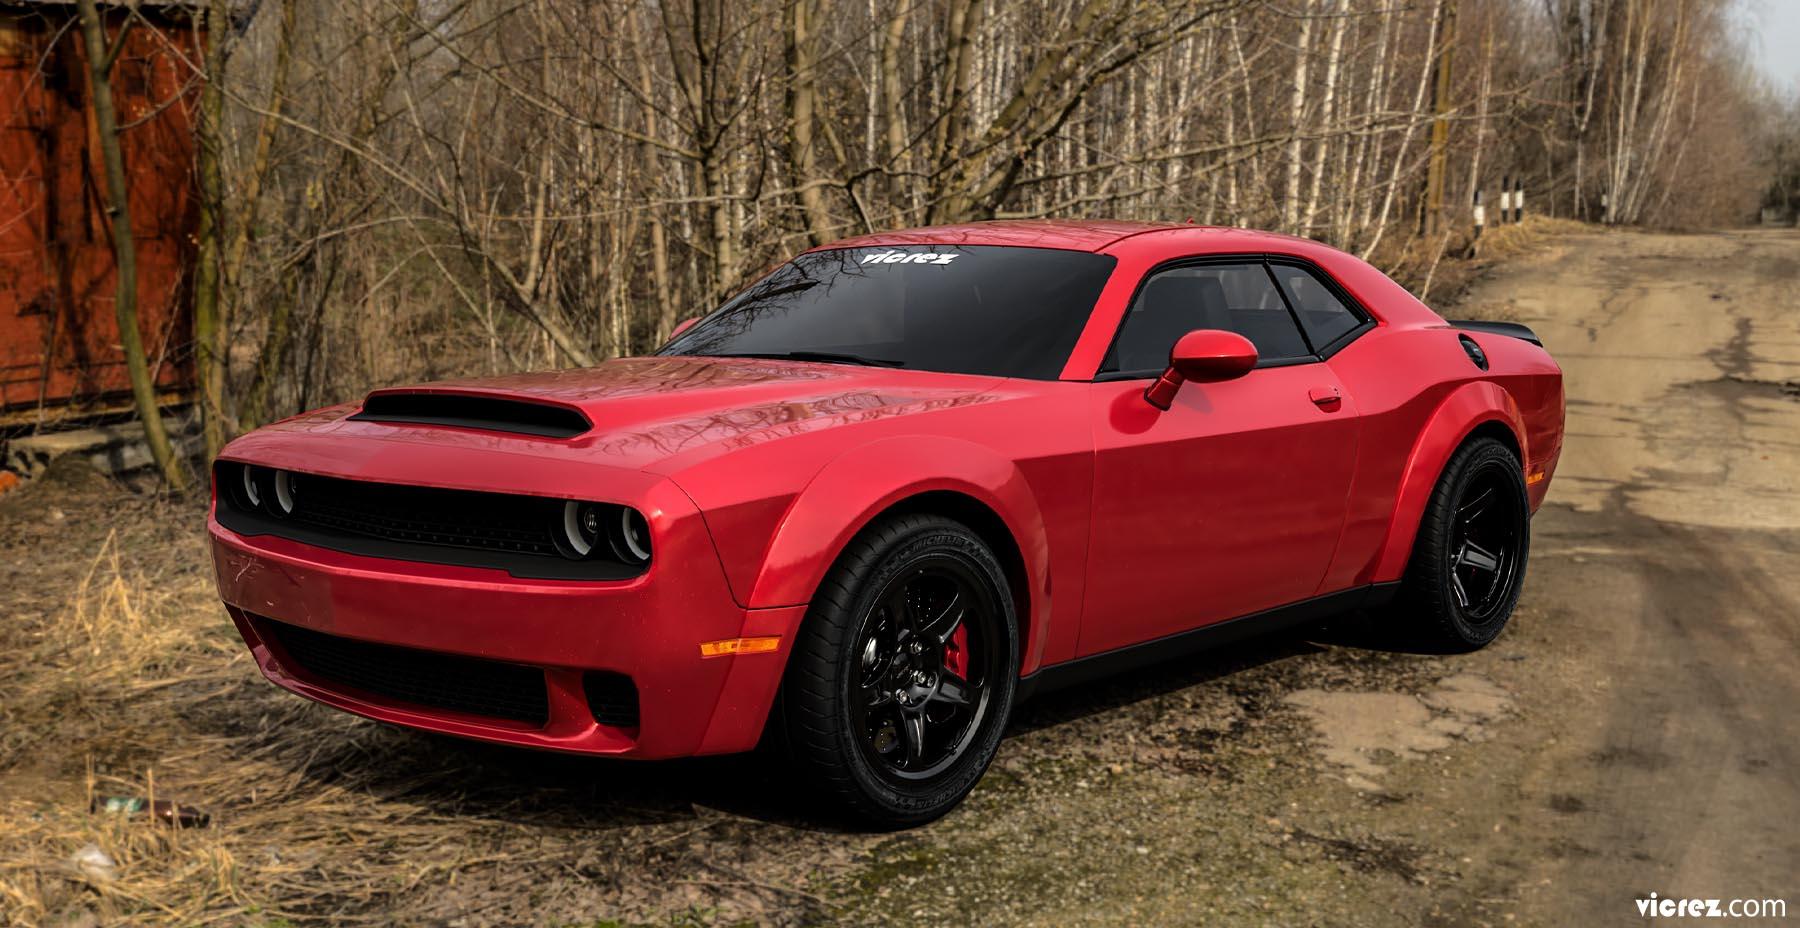 Red Vicrez Hood W/ Air Vent Scoop Demon Style vz102129 | Dodge Challenger 2008-2020